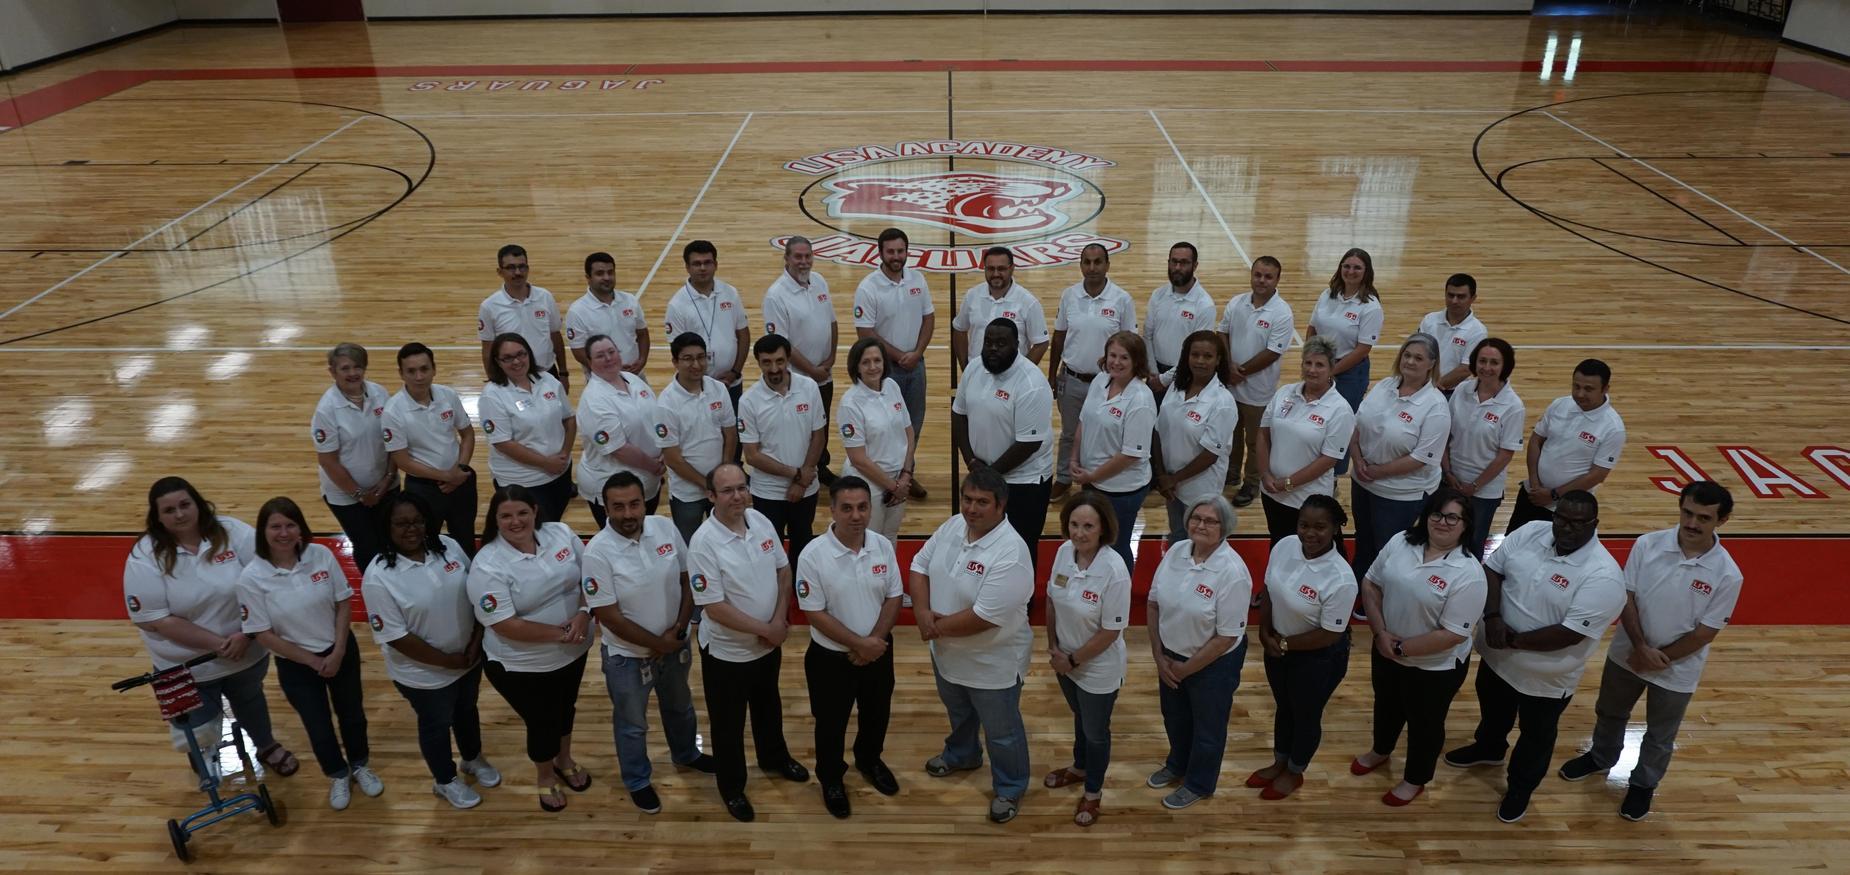 District leadership team photo